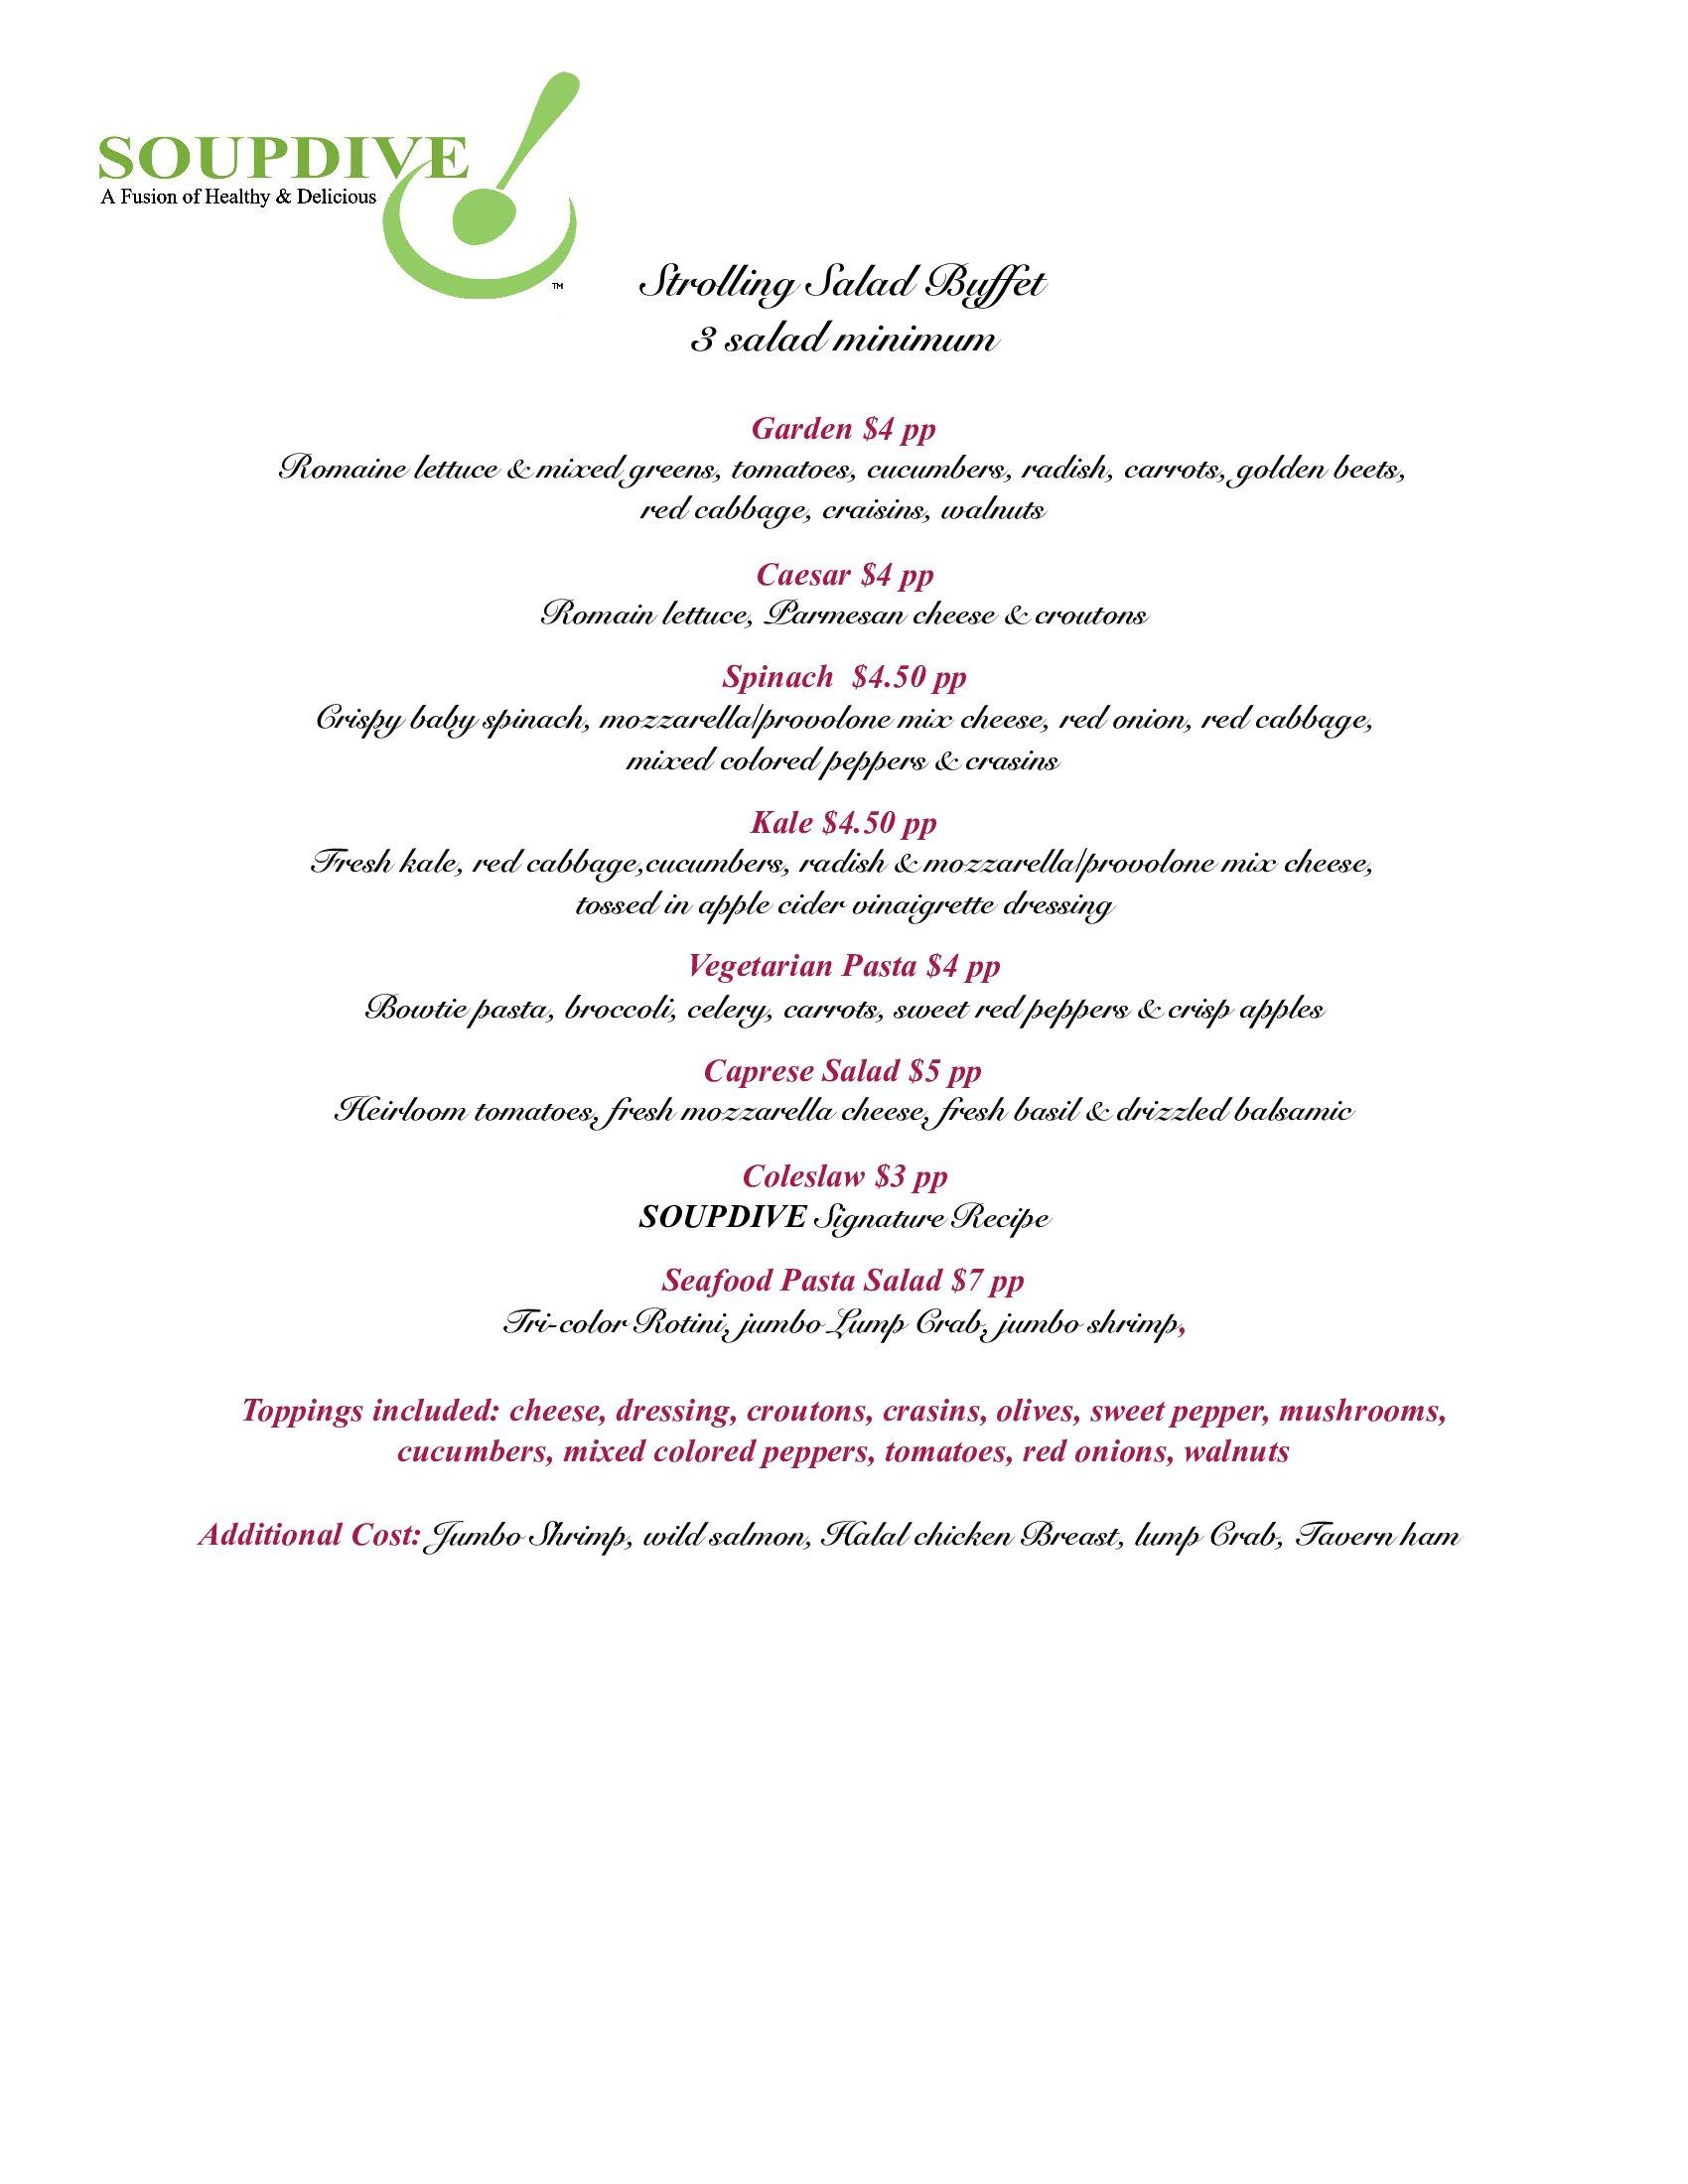 SDC Salad Menu.jpg